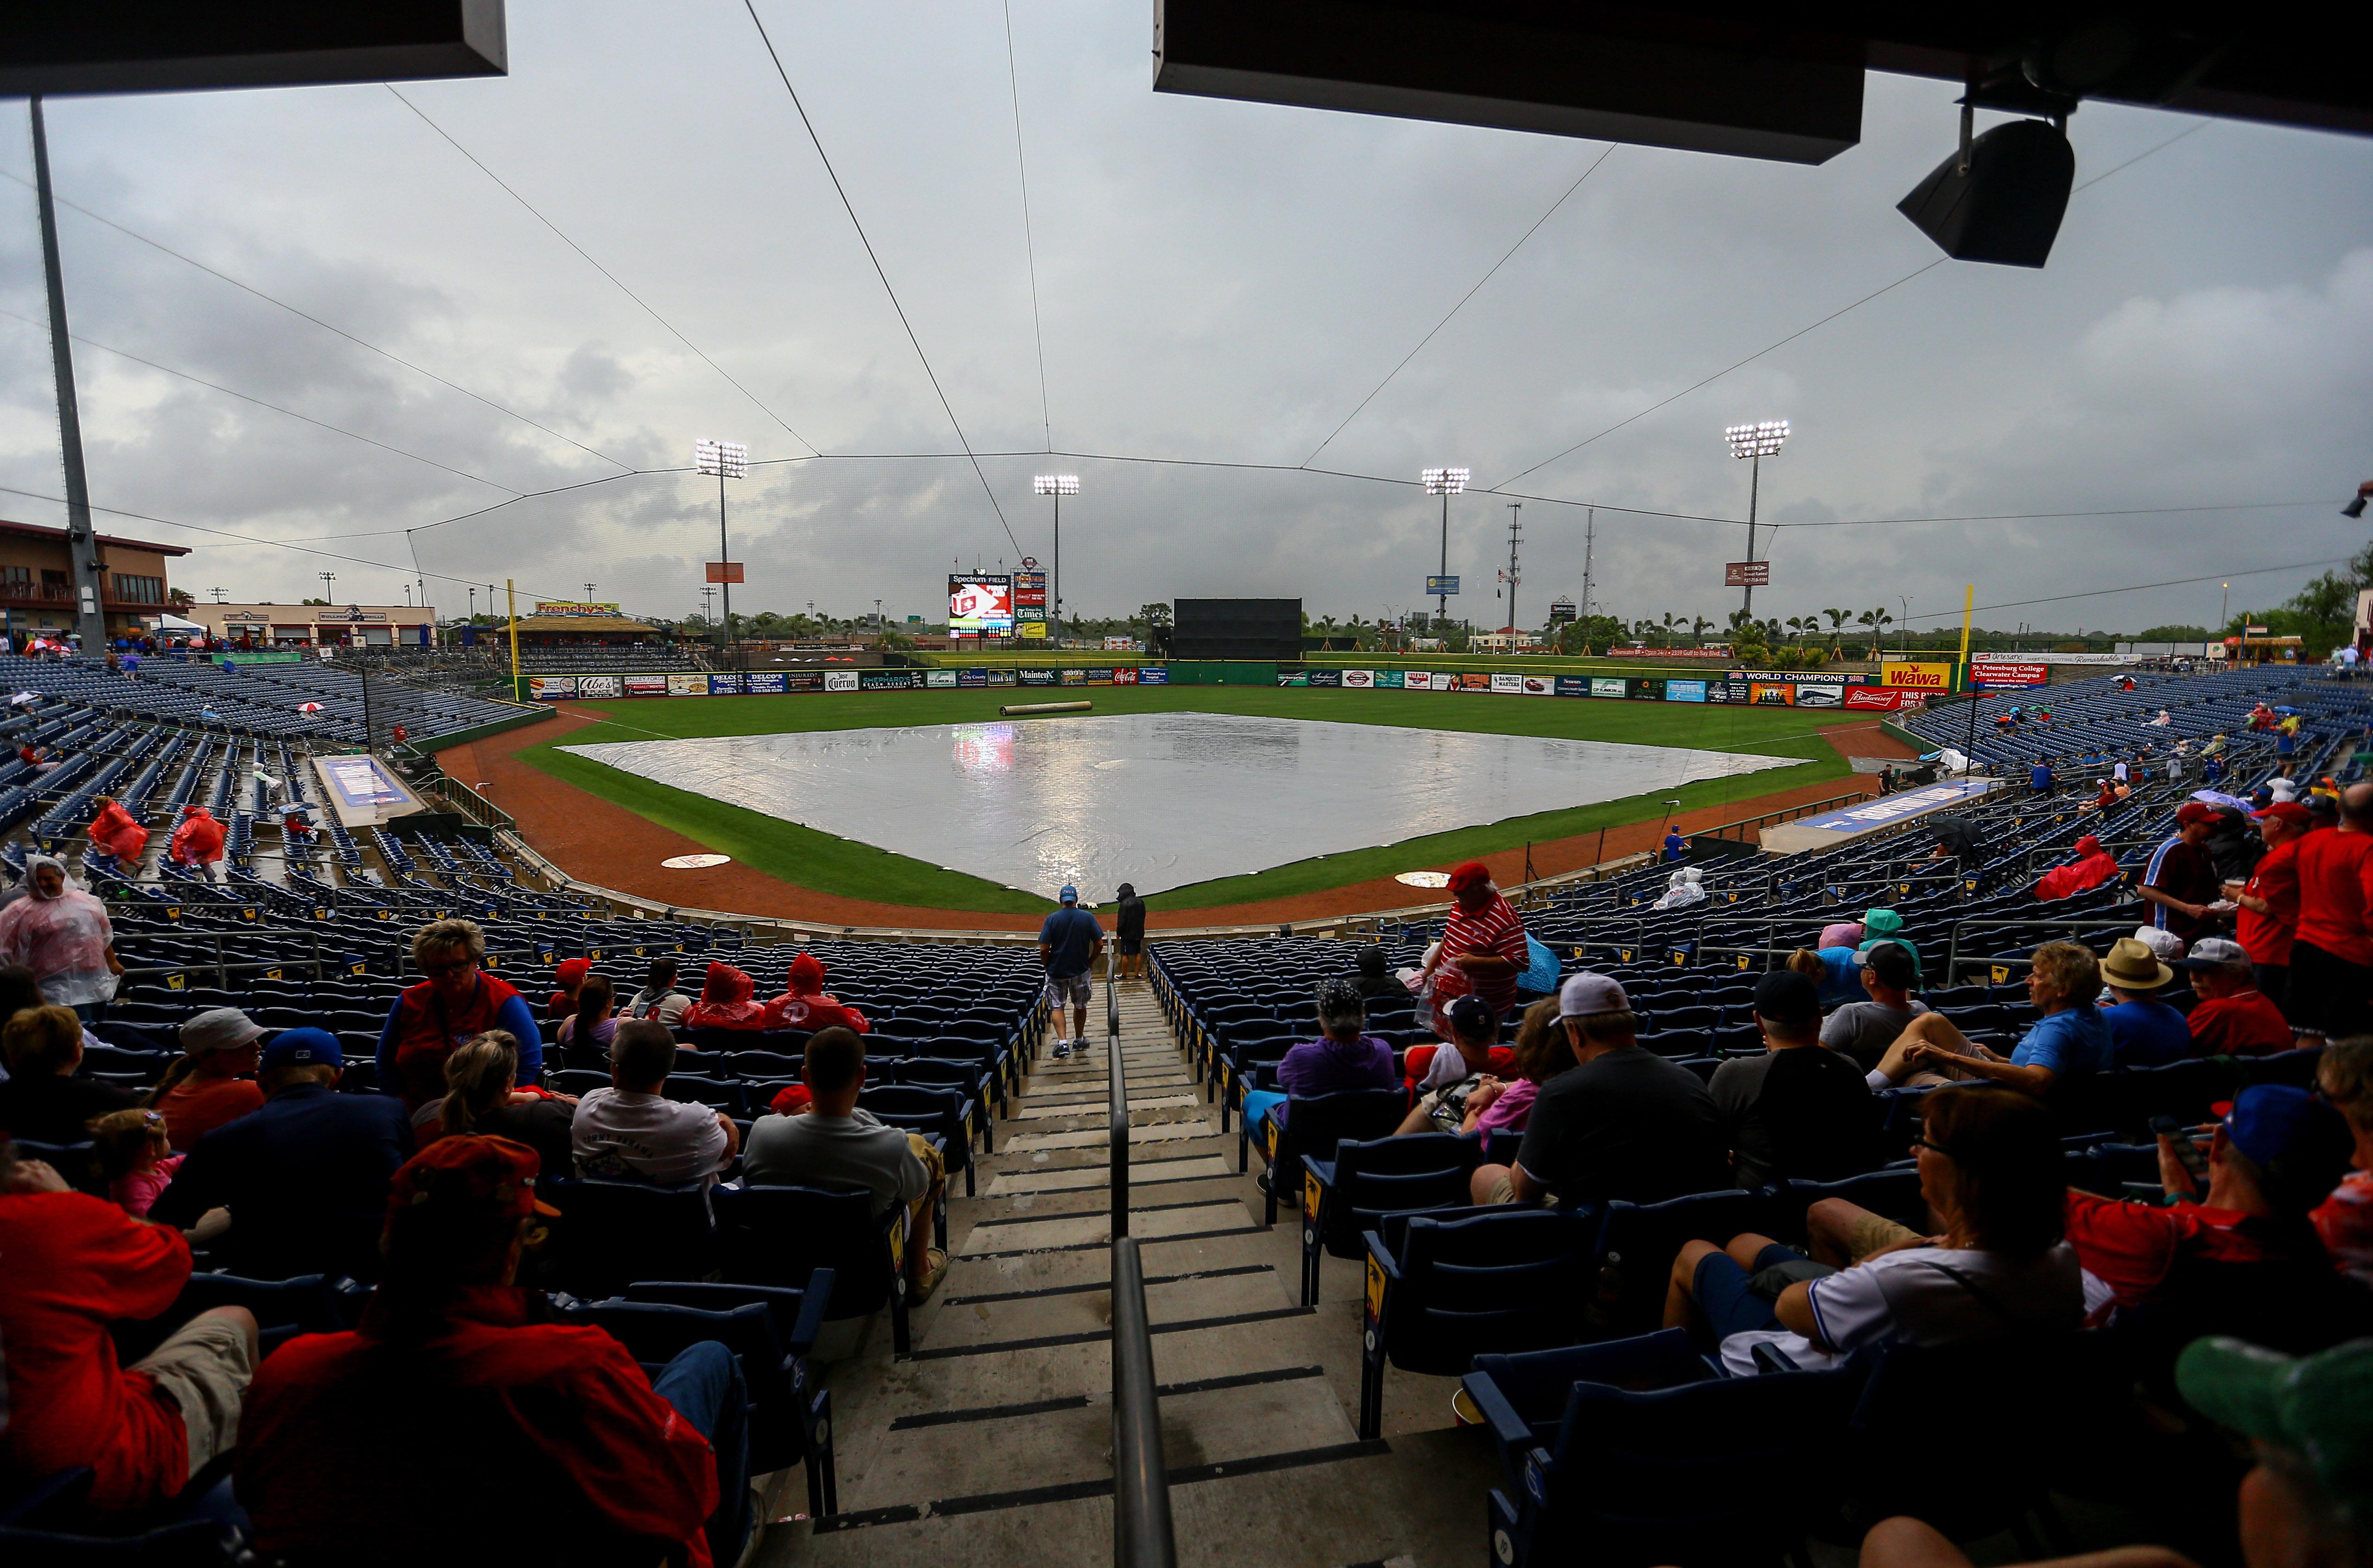 2d0f07c9e0c NC State-ECU baseball game canceled because of weather